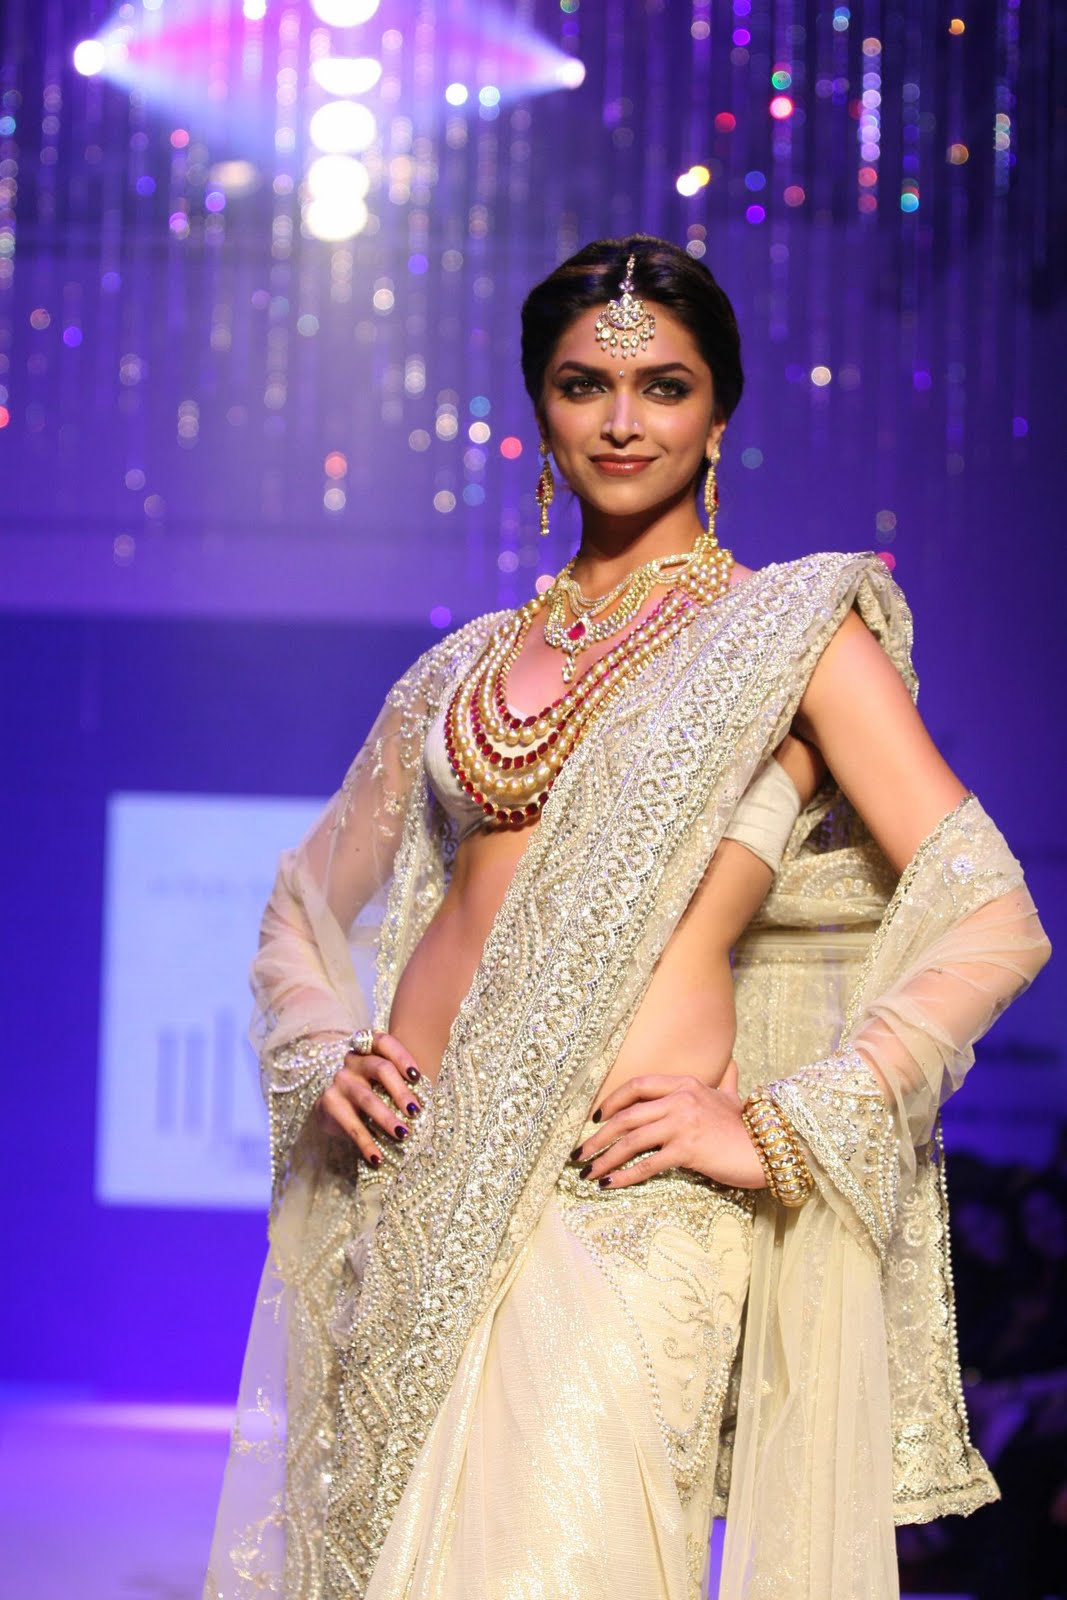 Fall Hd Yuvraj Singh Wallpaper Hairstyle For You Deepika Padukone Hairstyle And Dress